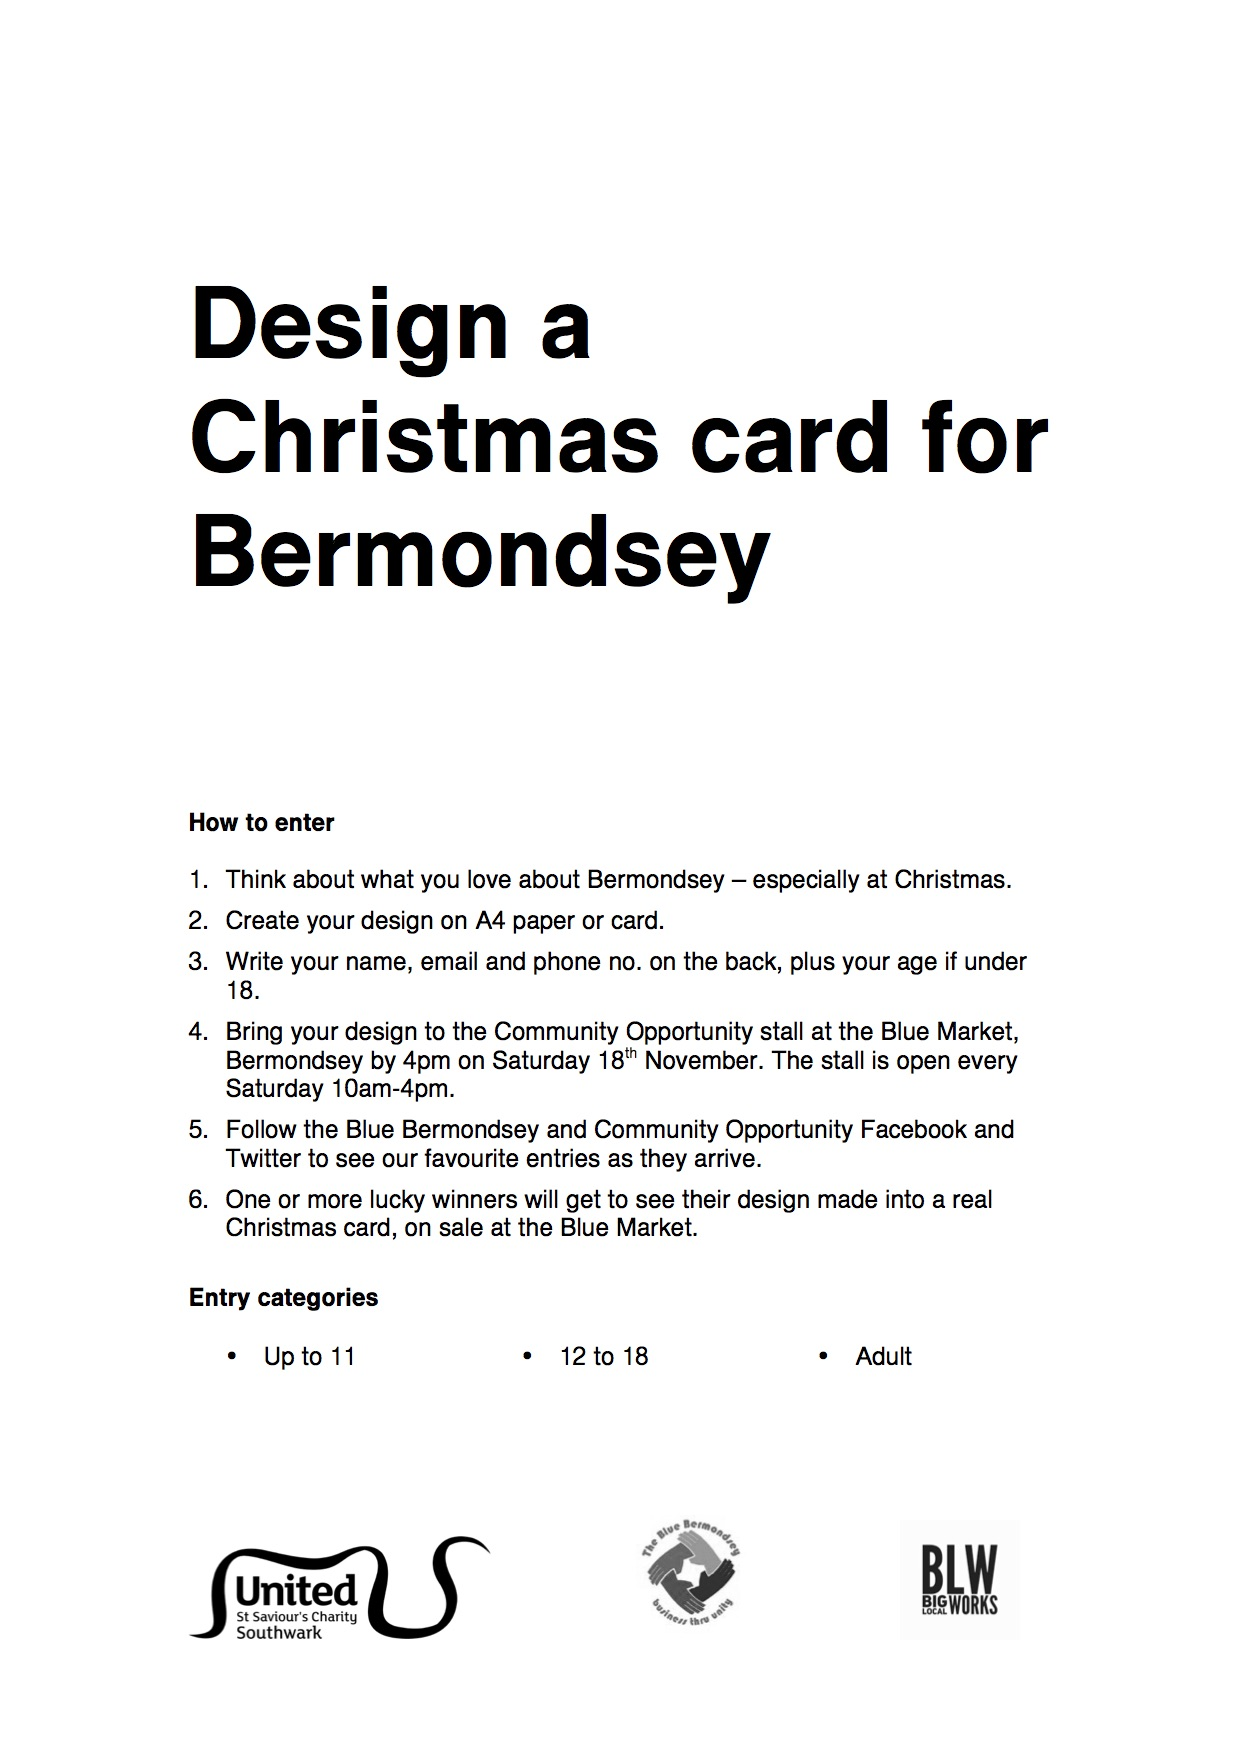 20171103 Design a Christmas card for Bermondsey